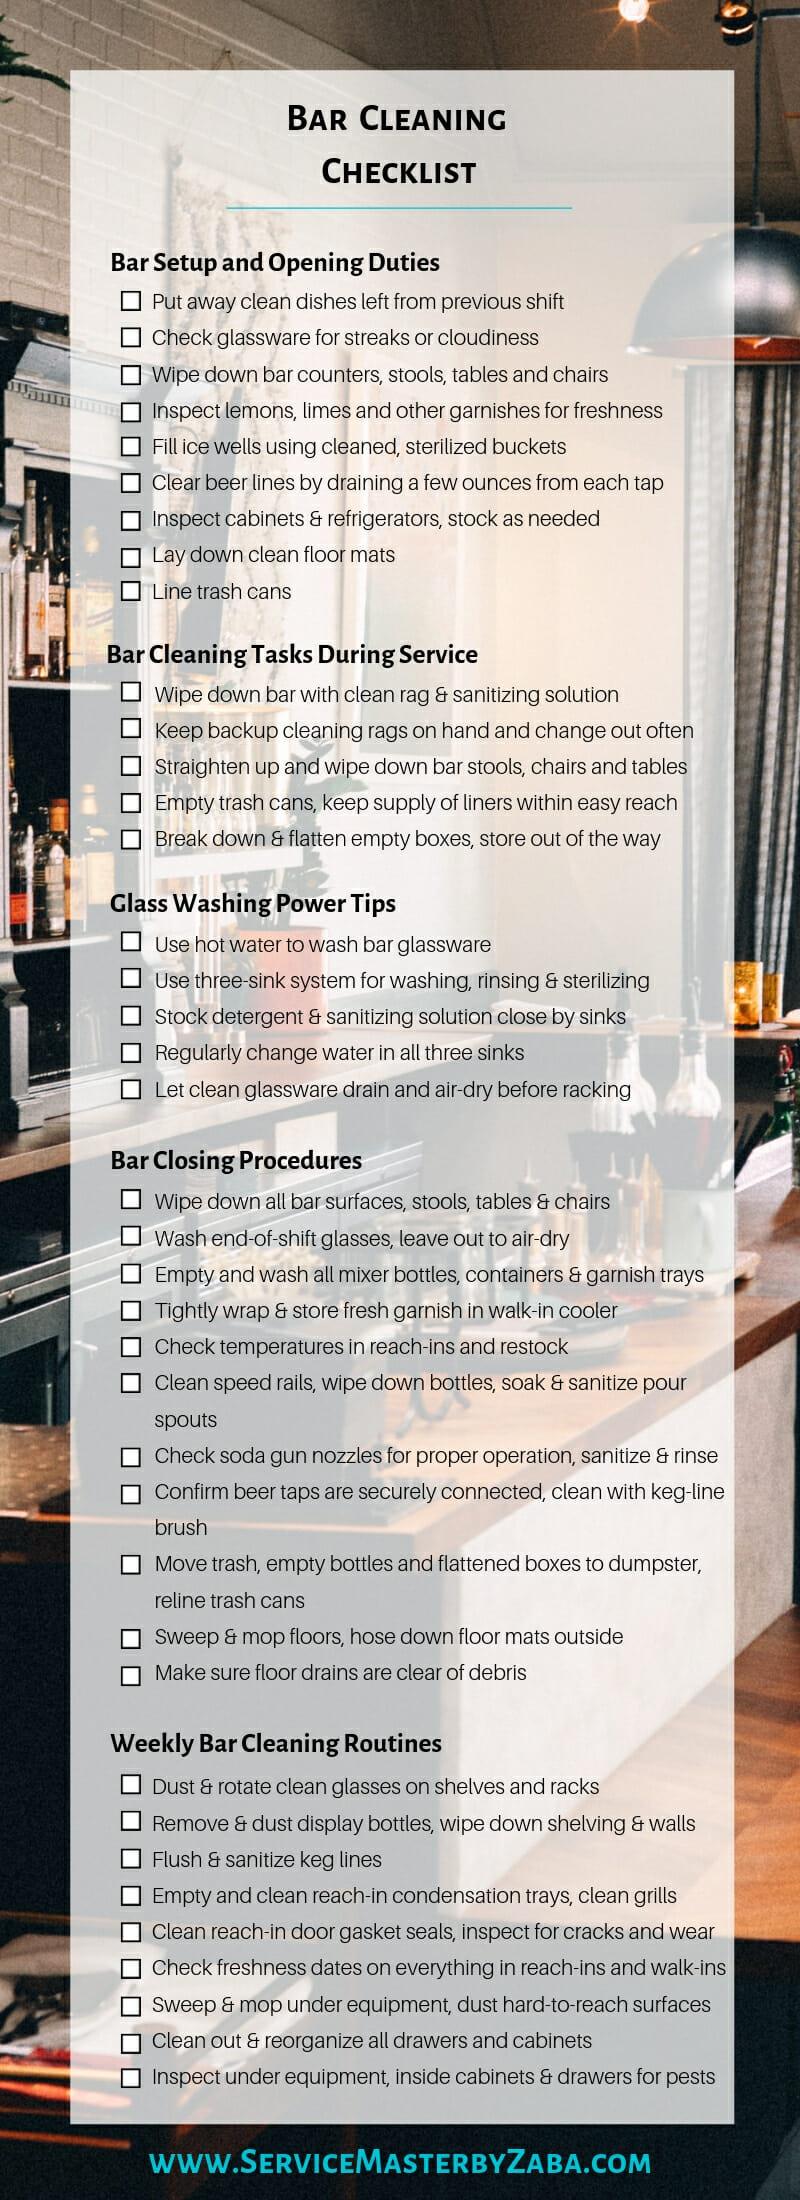 bar cleaning checklist